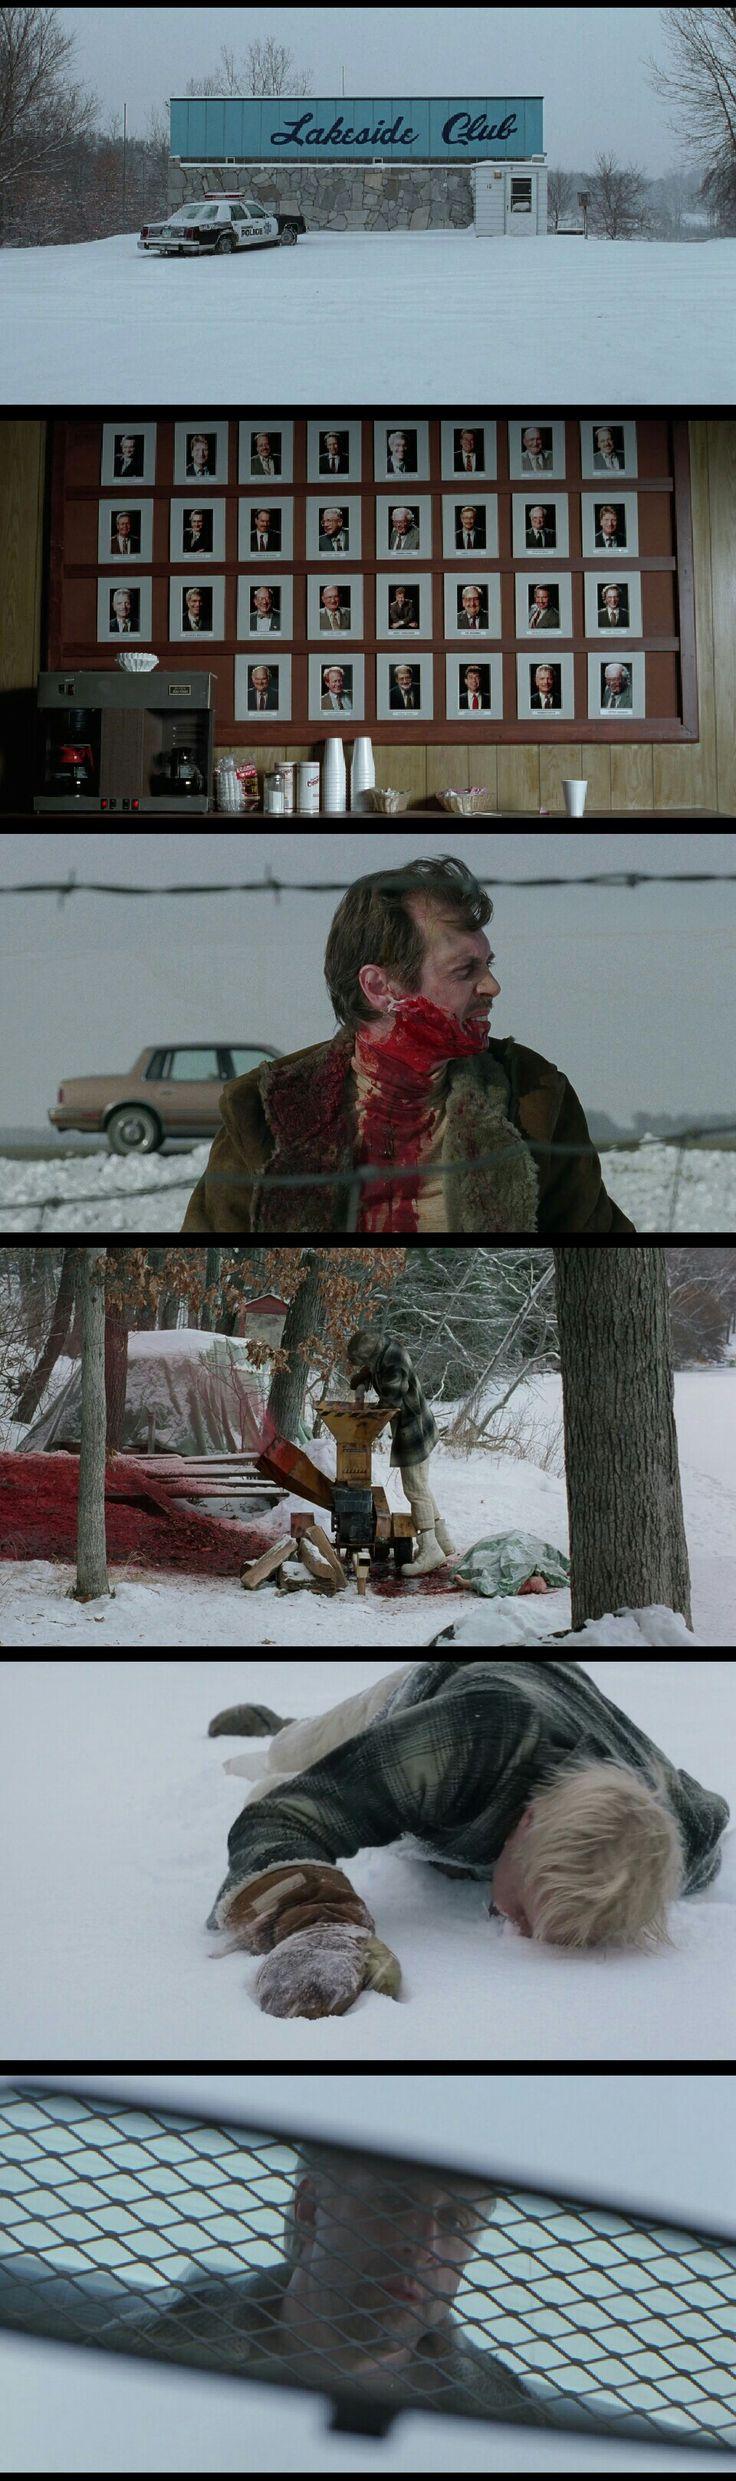 Fargo(1996). Cinematography by Roger Deakins.